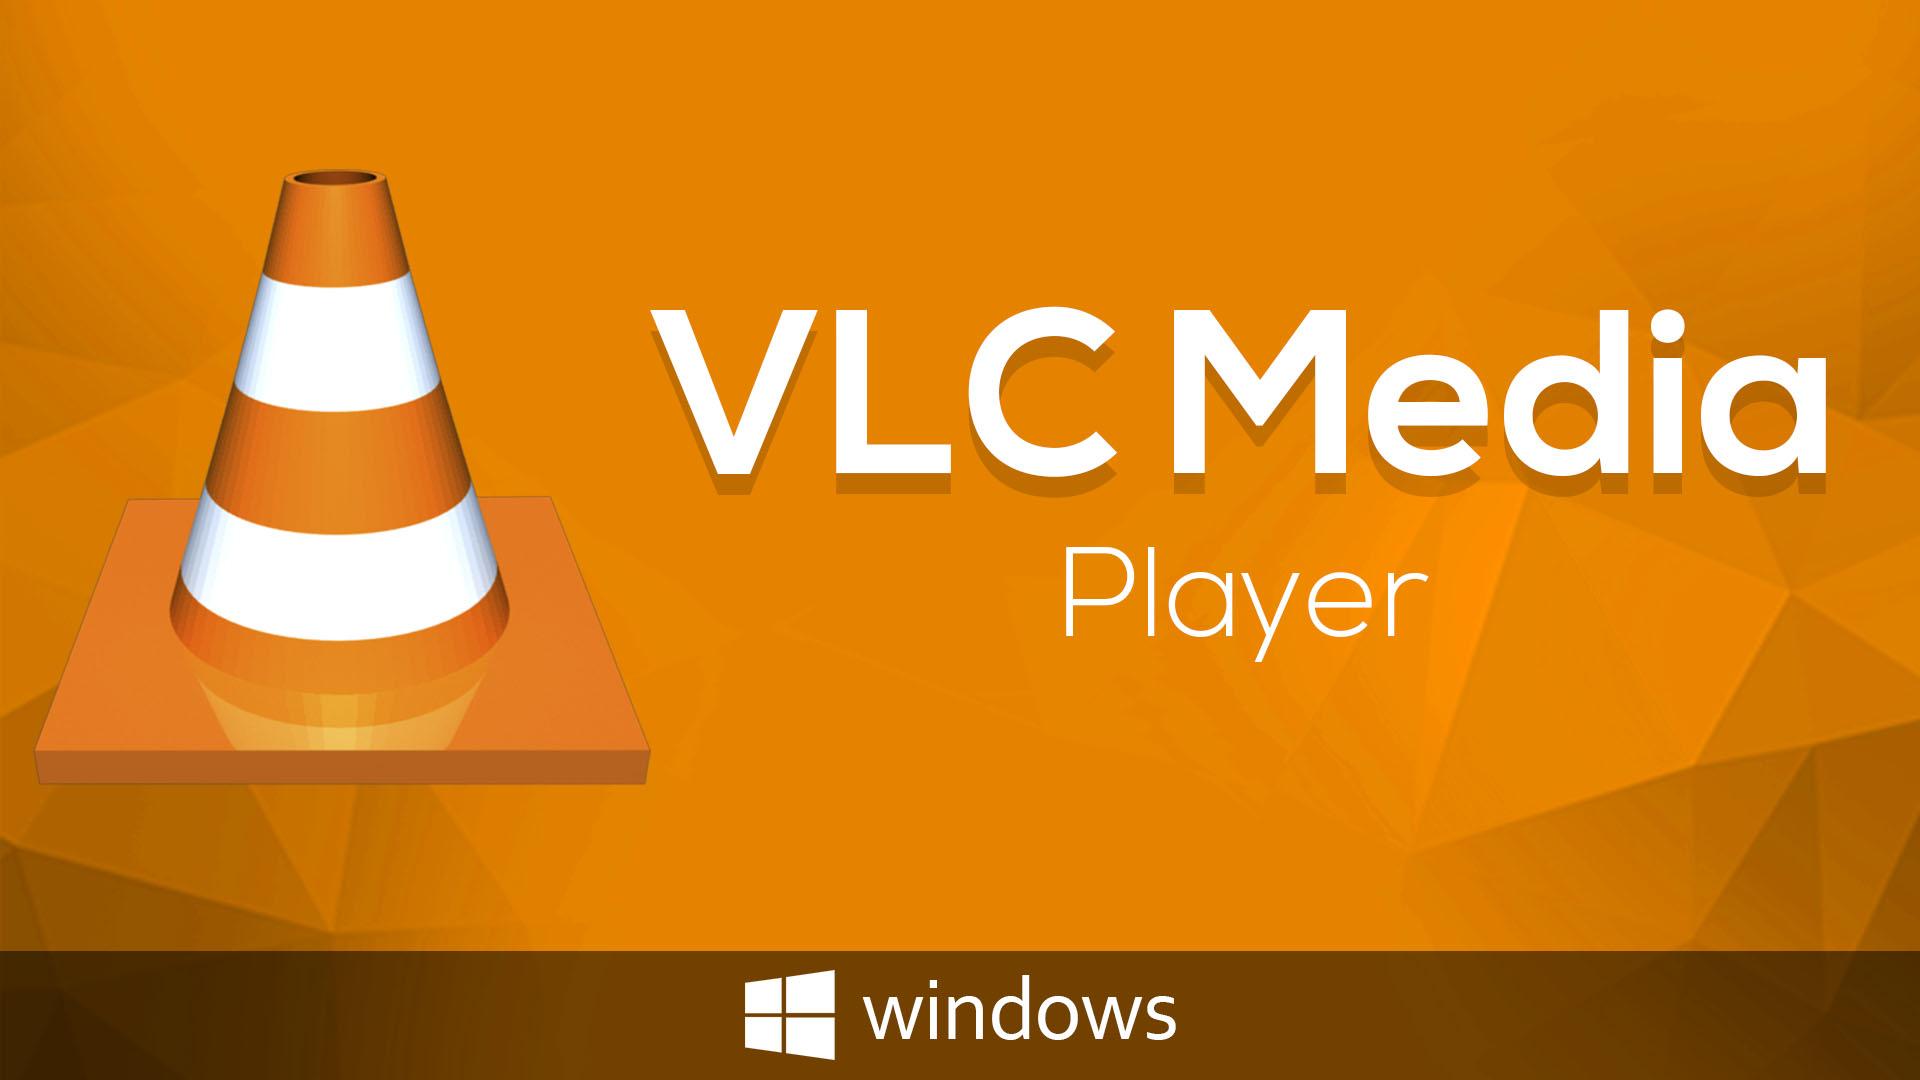 VideoLAN Media Player 3.0.4AOLL Silent Install